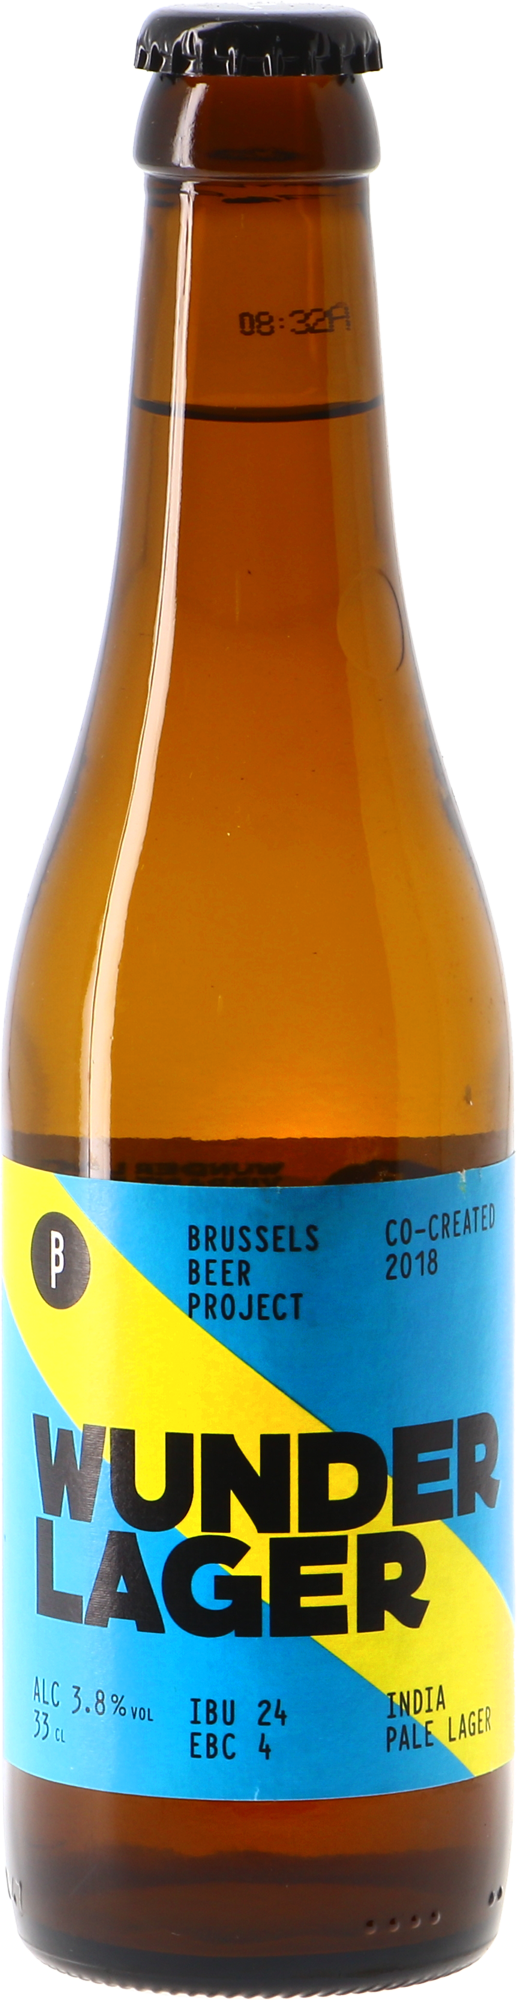 Brussels Beer Project Wunder Lager